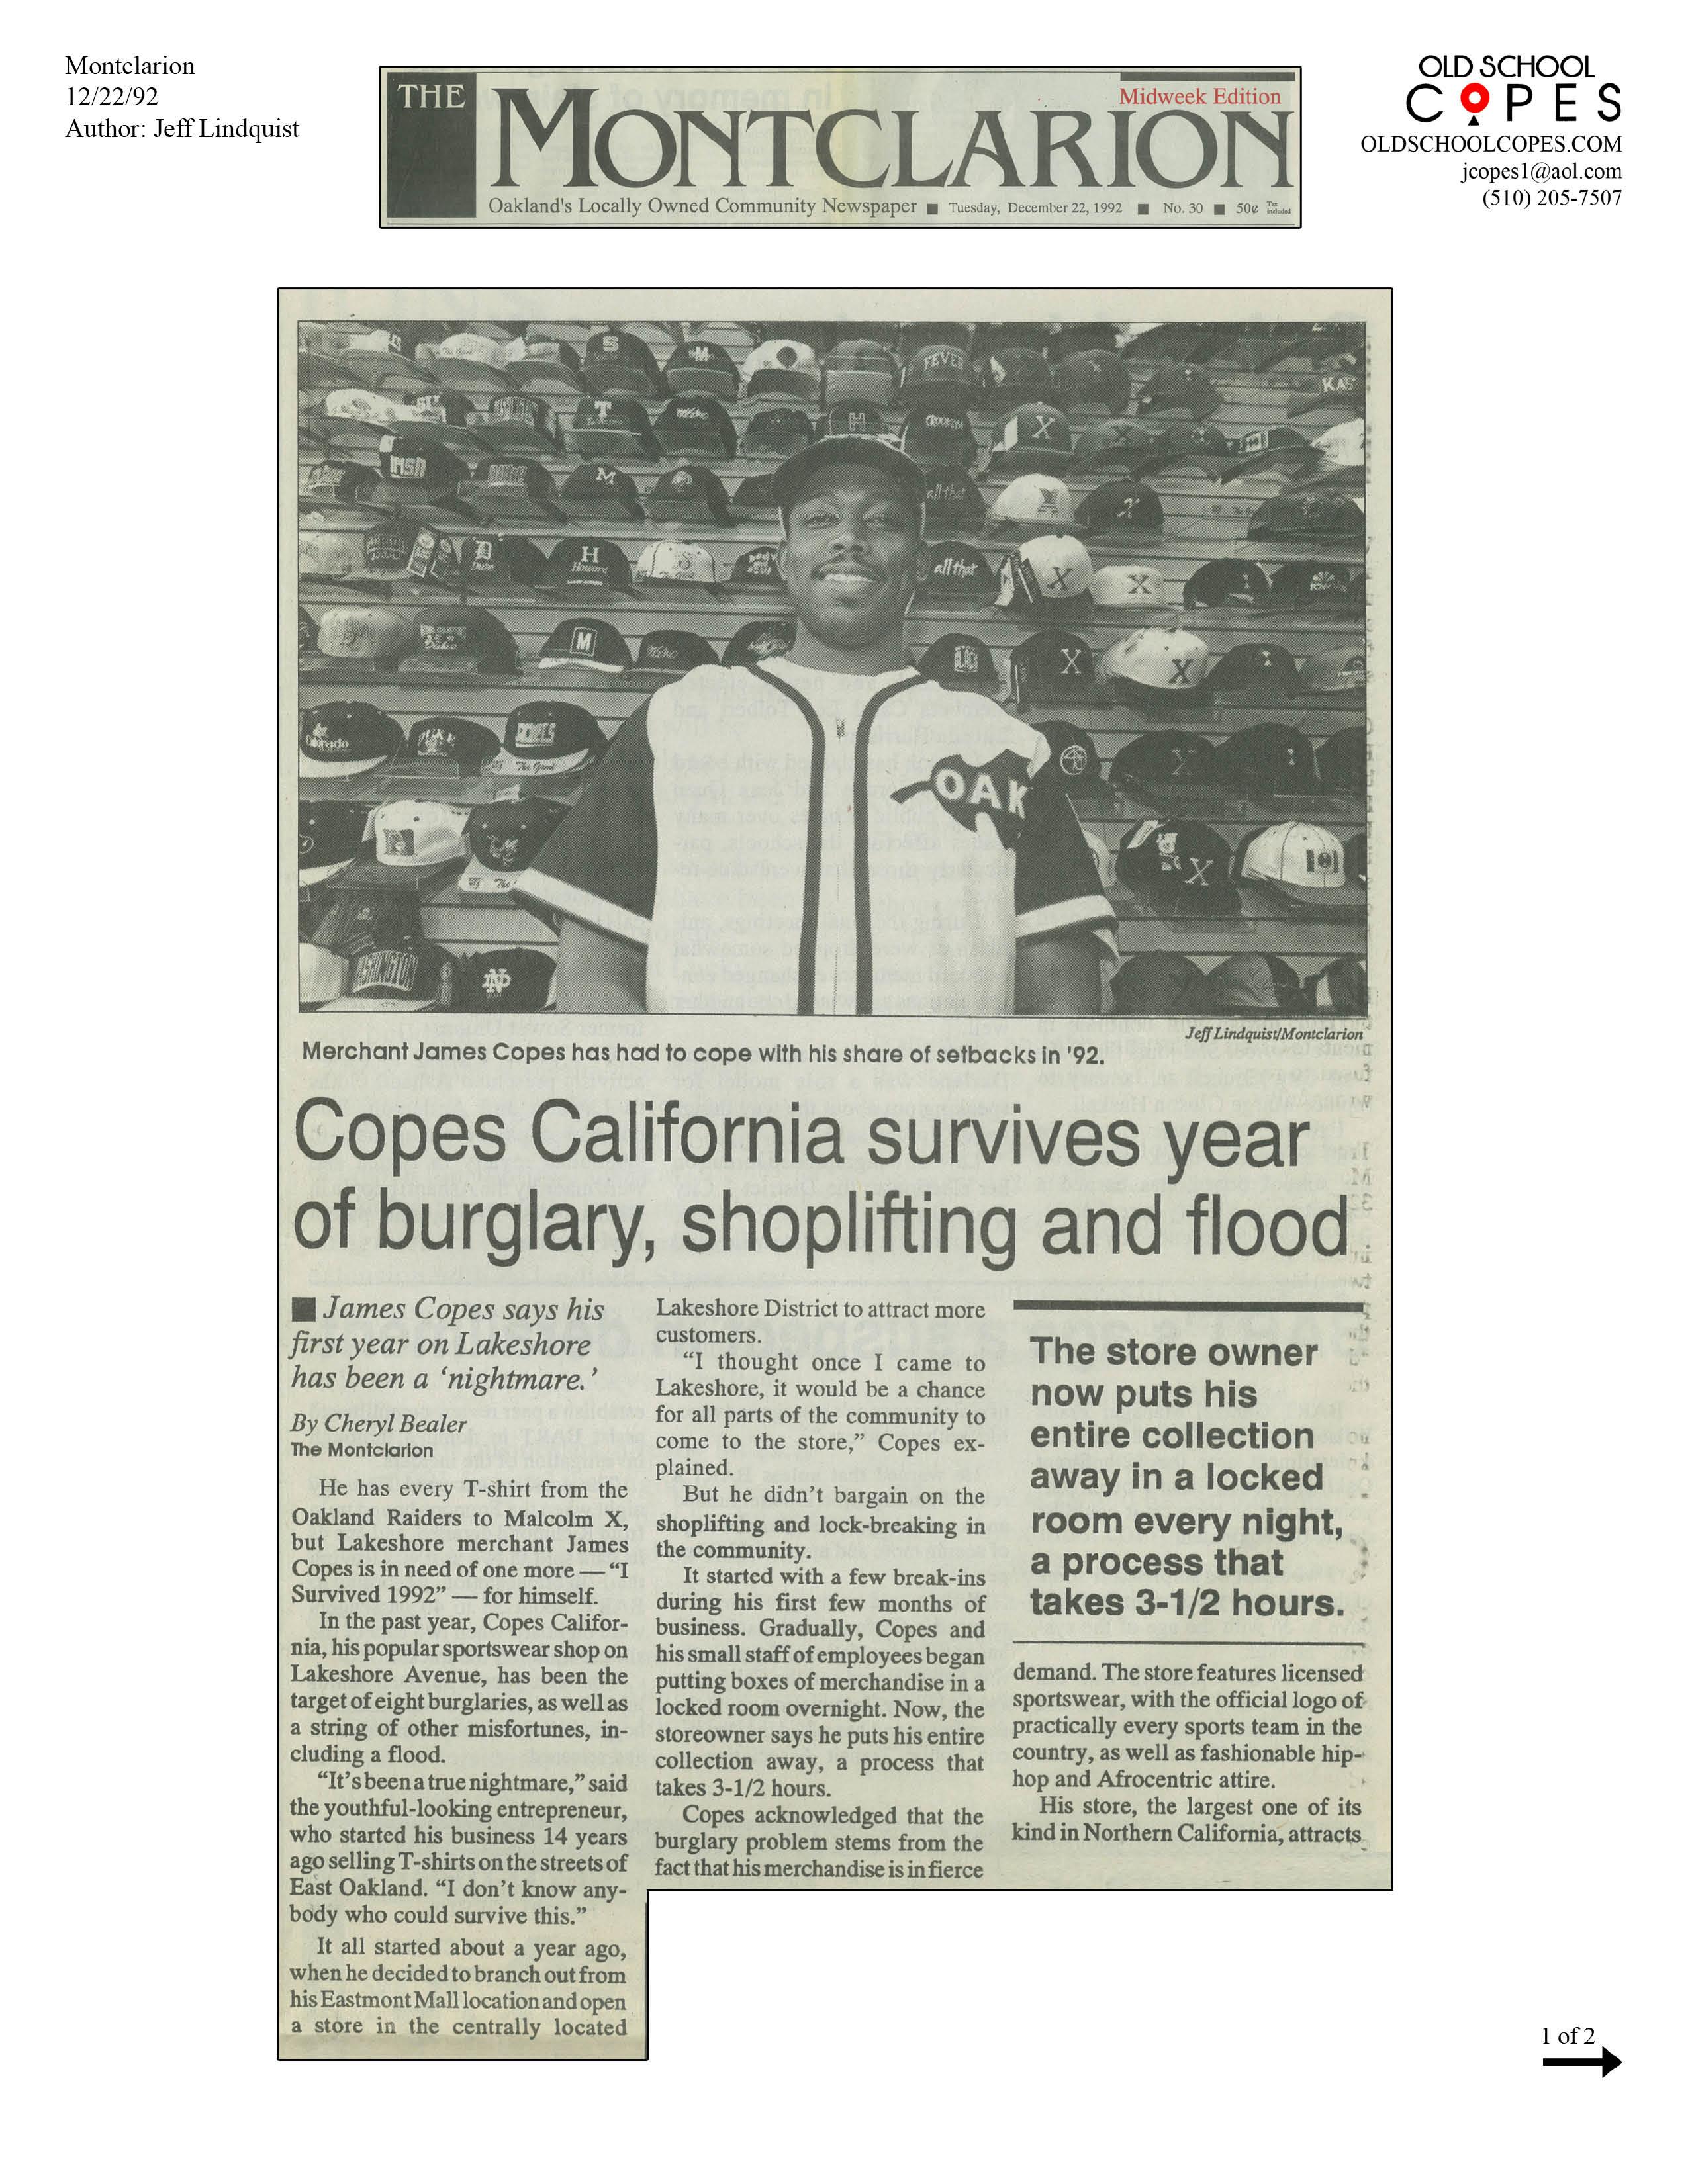 old-school-copes-press3.jpg